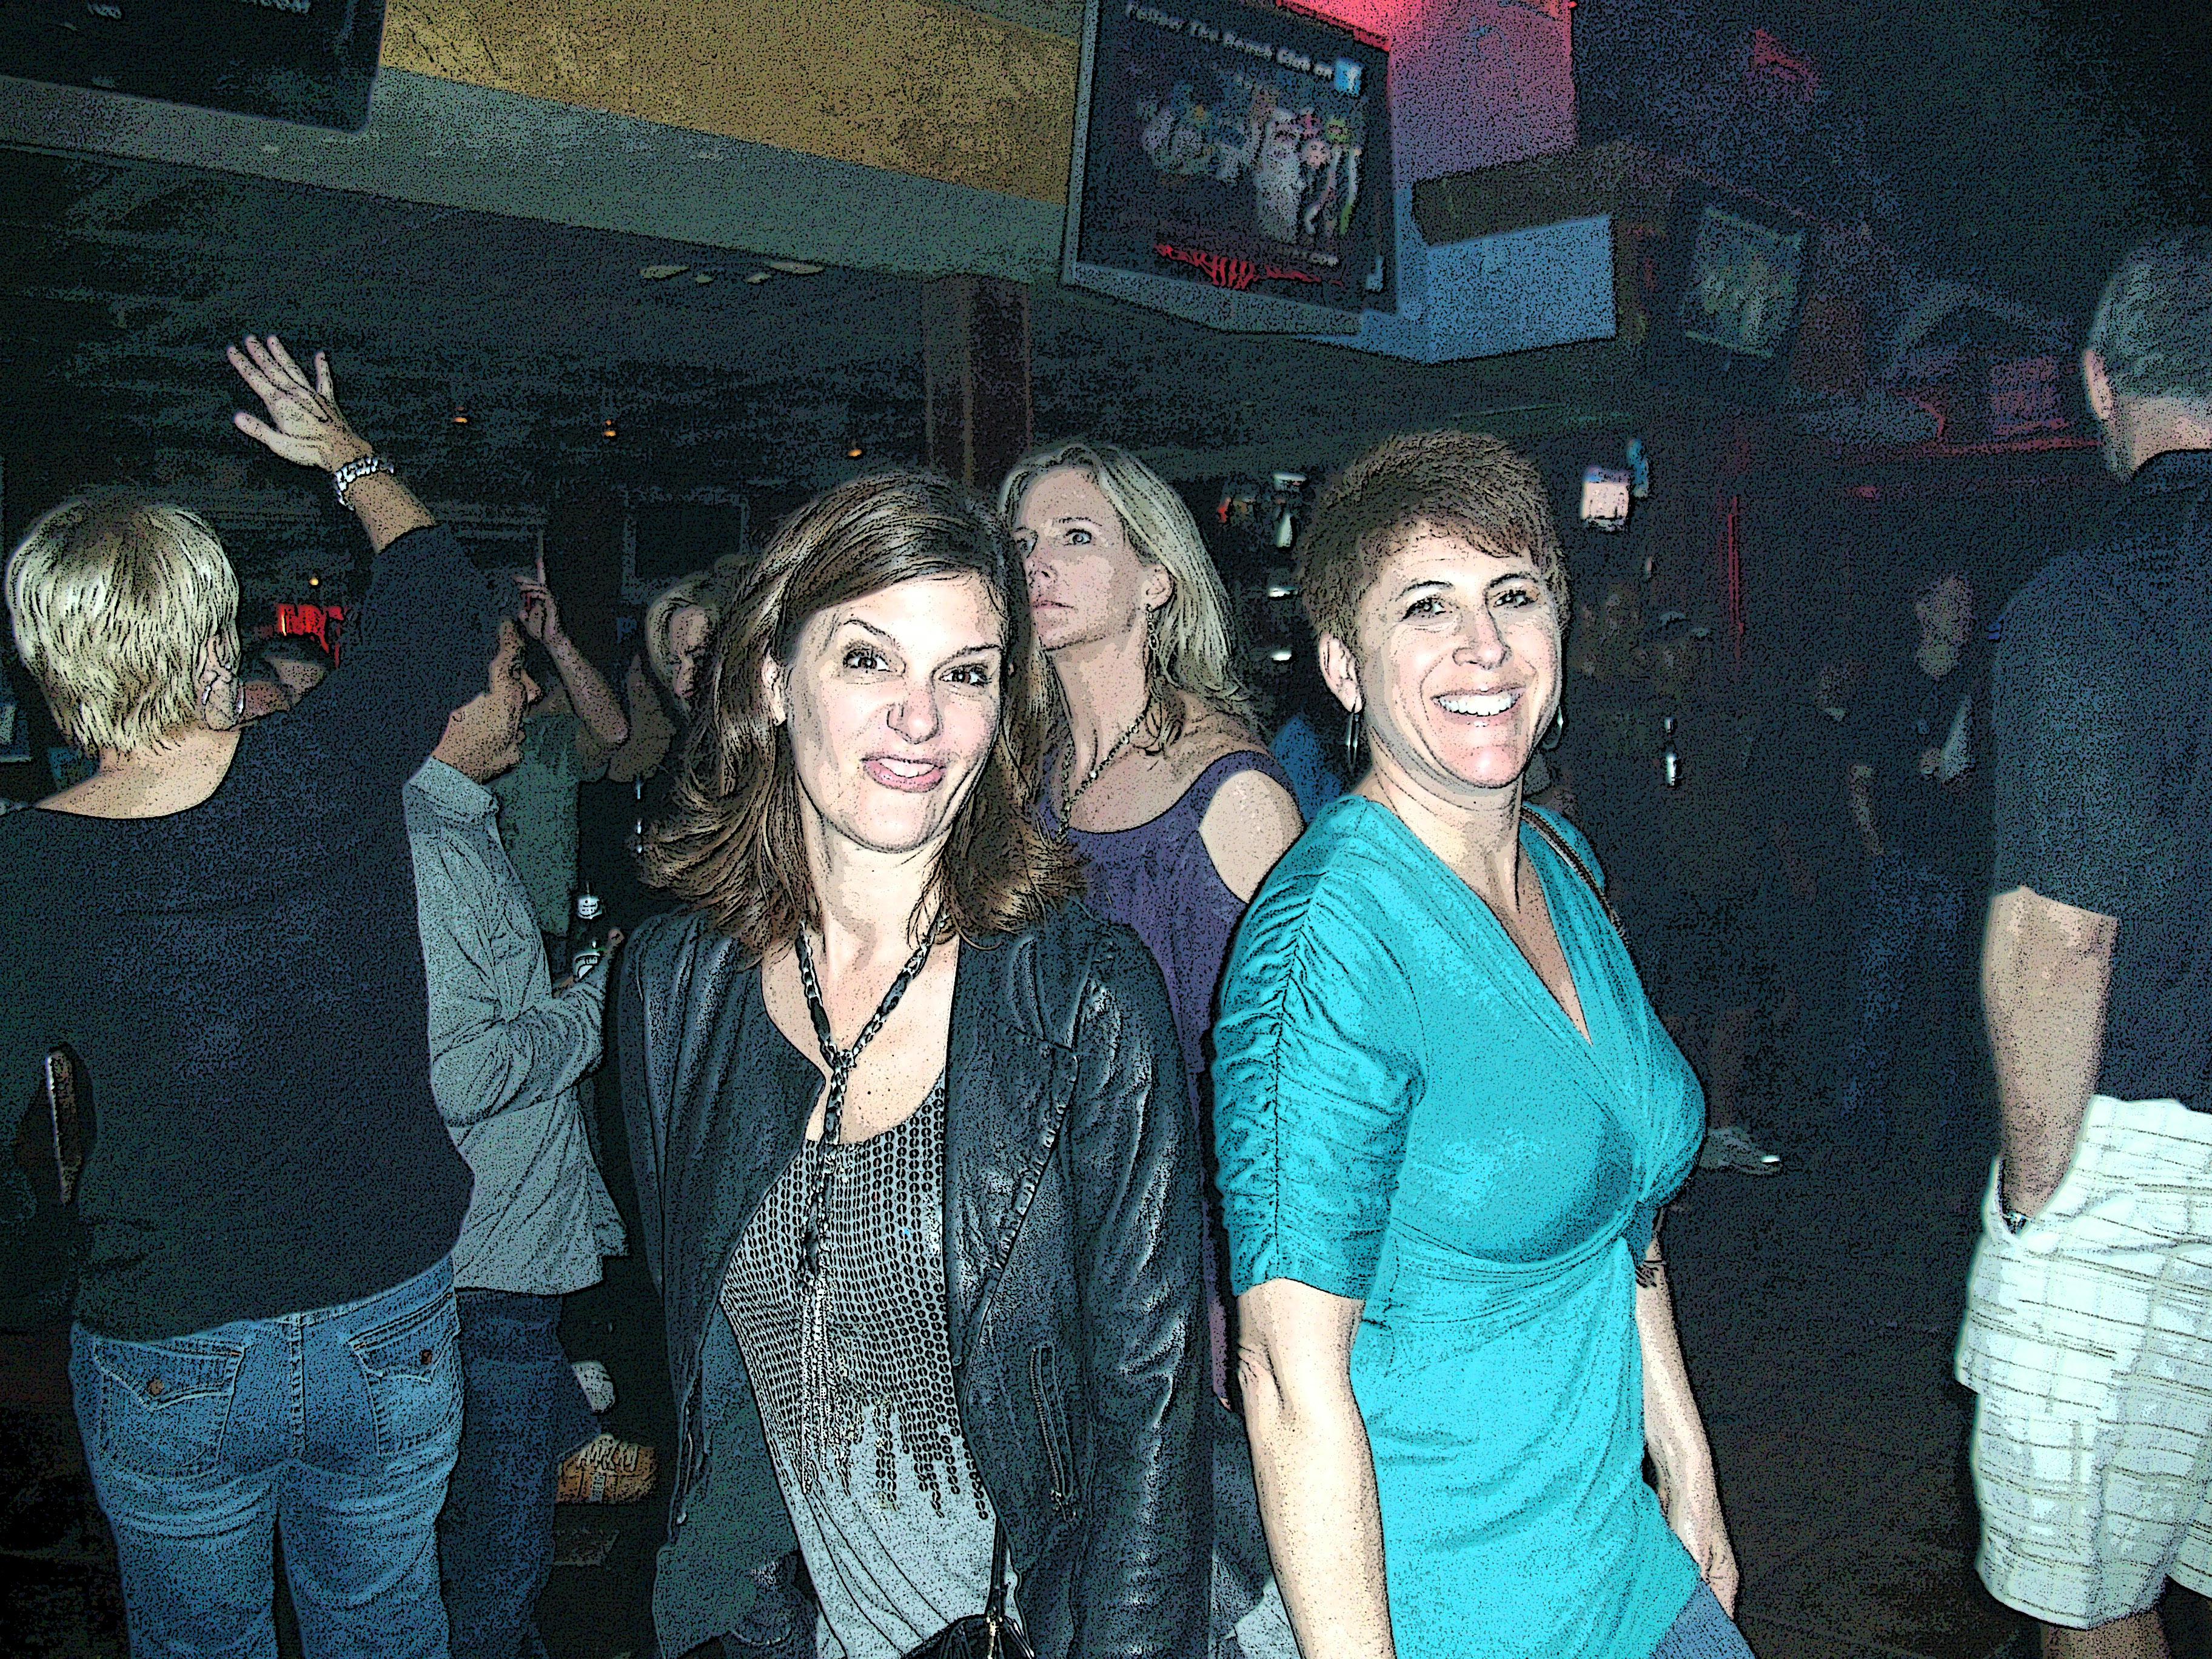 Orlando cougar bars